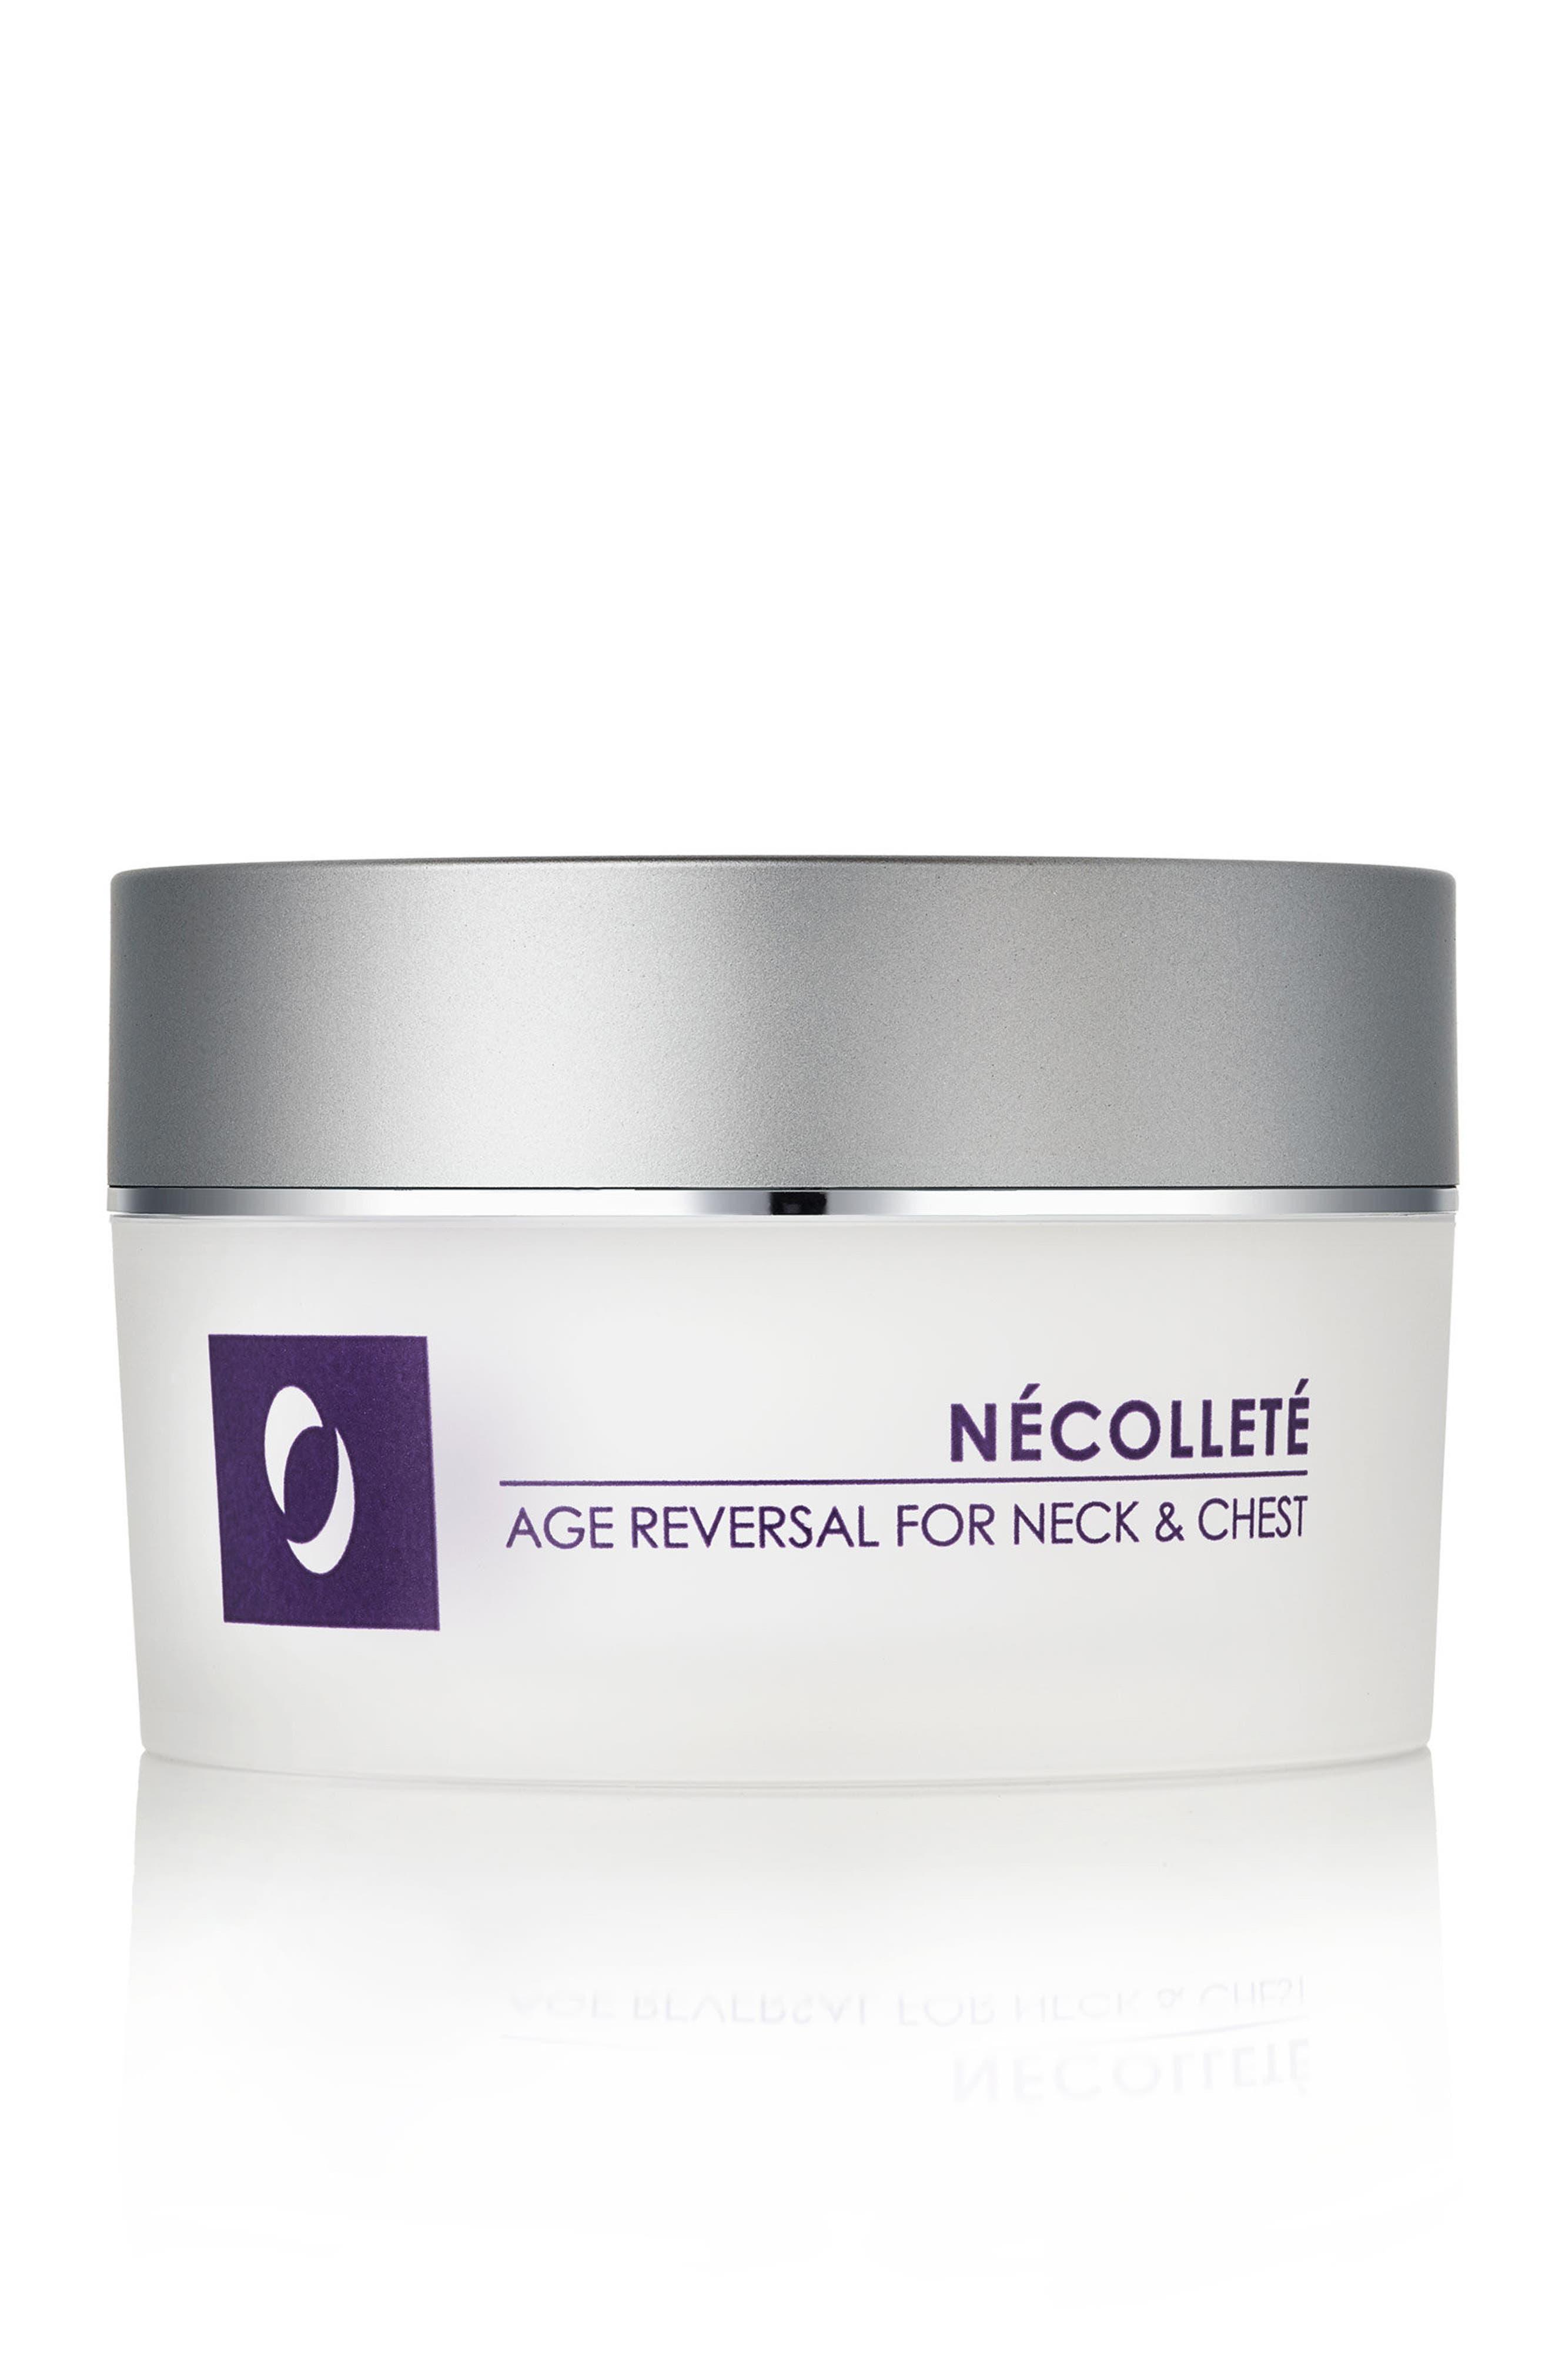 Alternate Image 1 Selected - Osmotics Cosmeceuticals Nécolleté Neck Lifting Cream